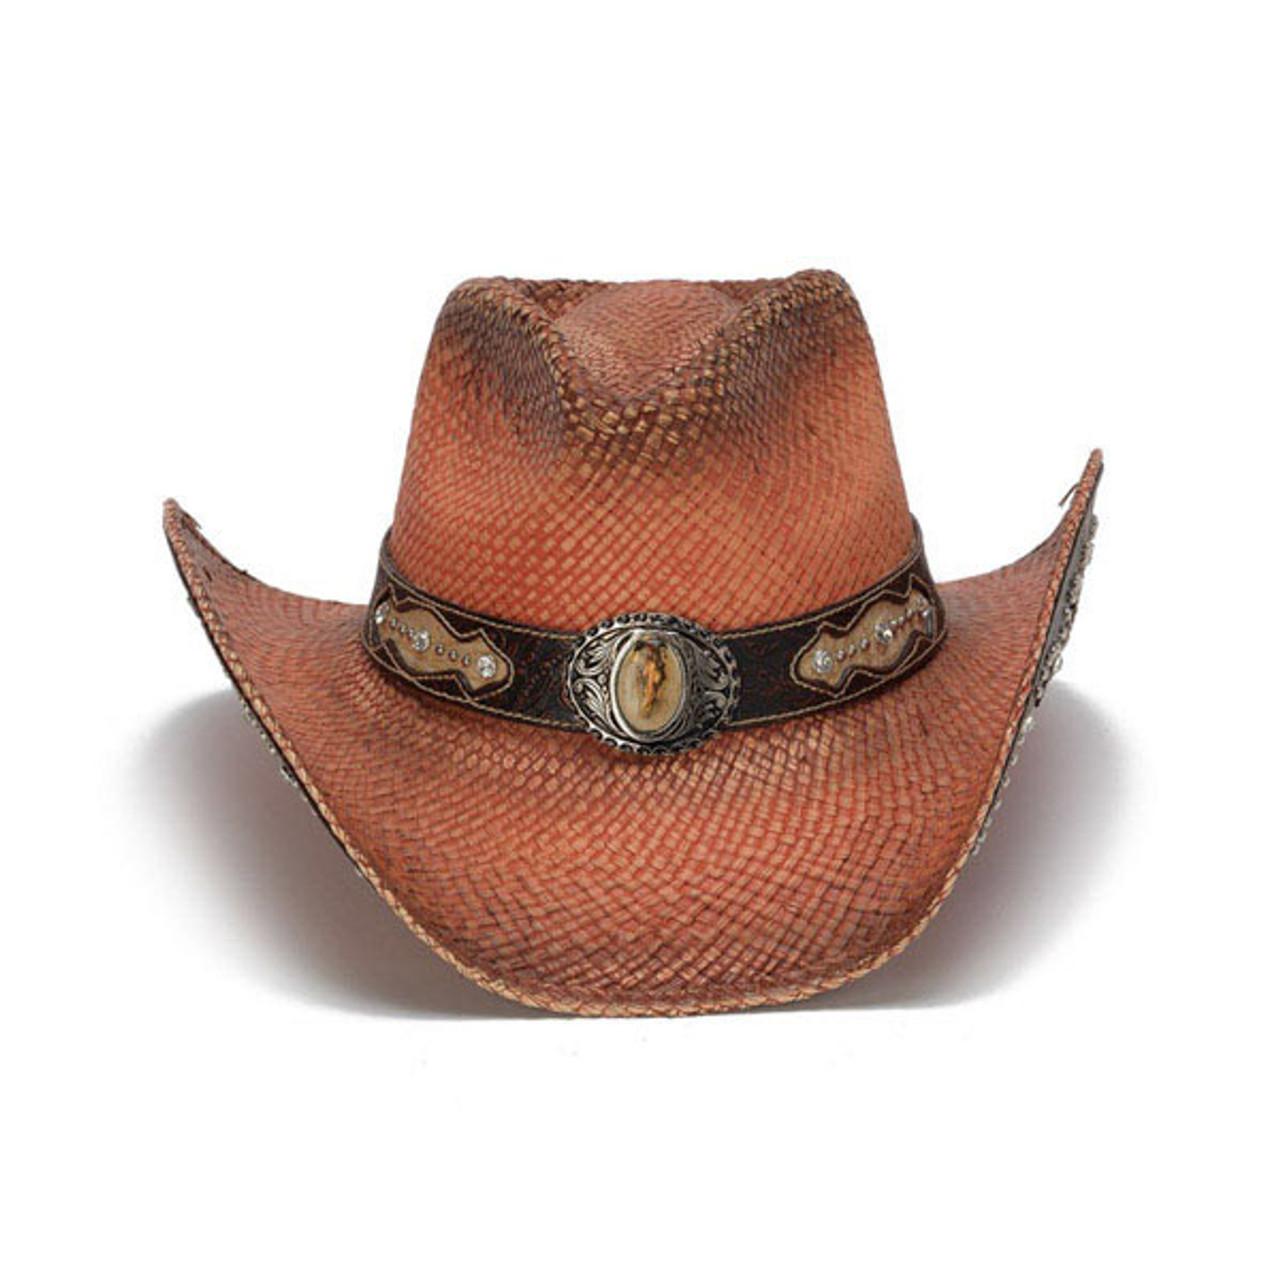 6c6aa11dc Stampede Hats -Orange Rhinestone Cowboy Hat